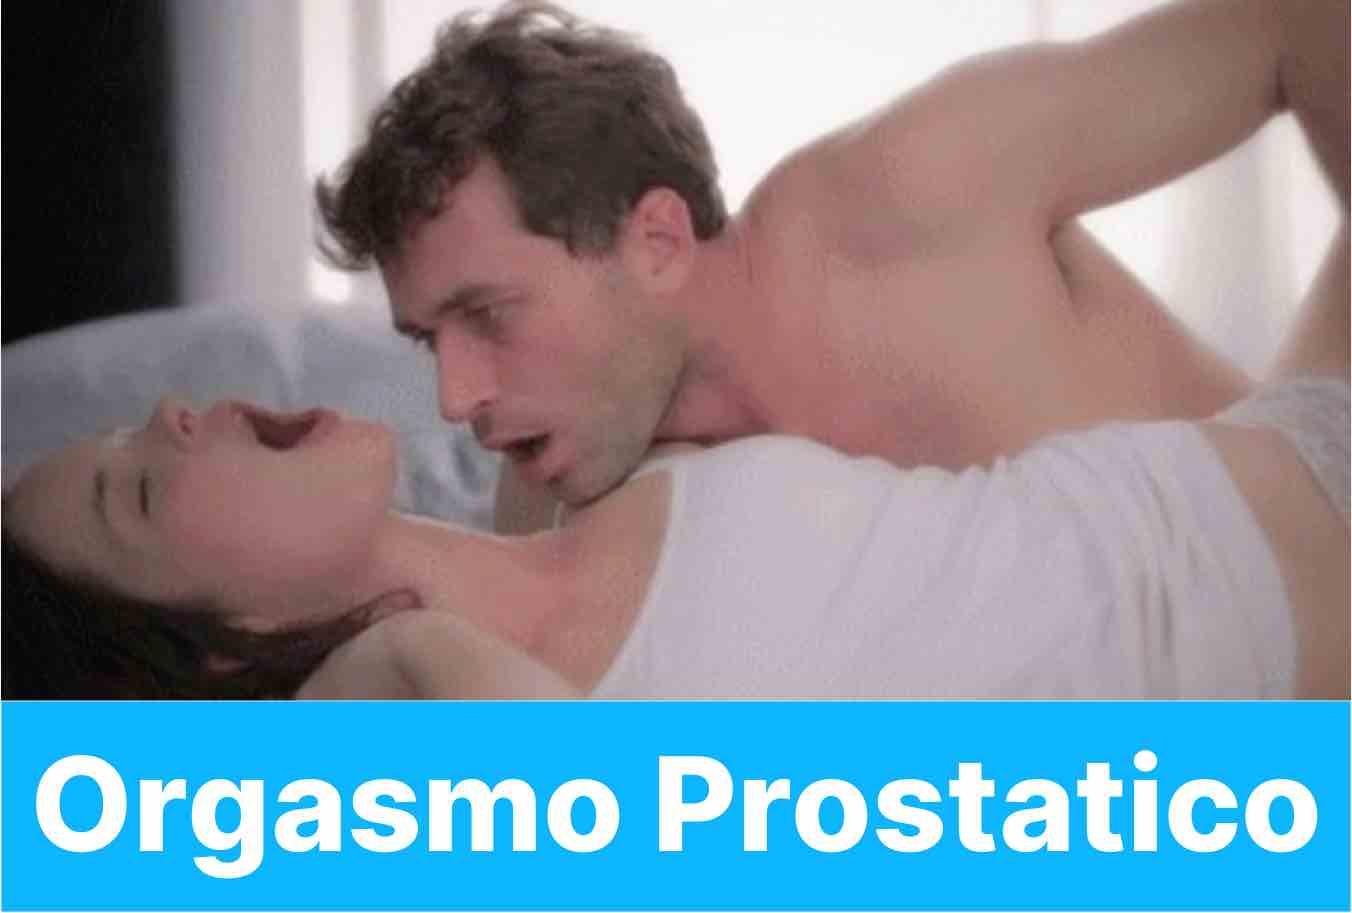 orgasmo prostatico